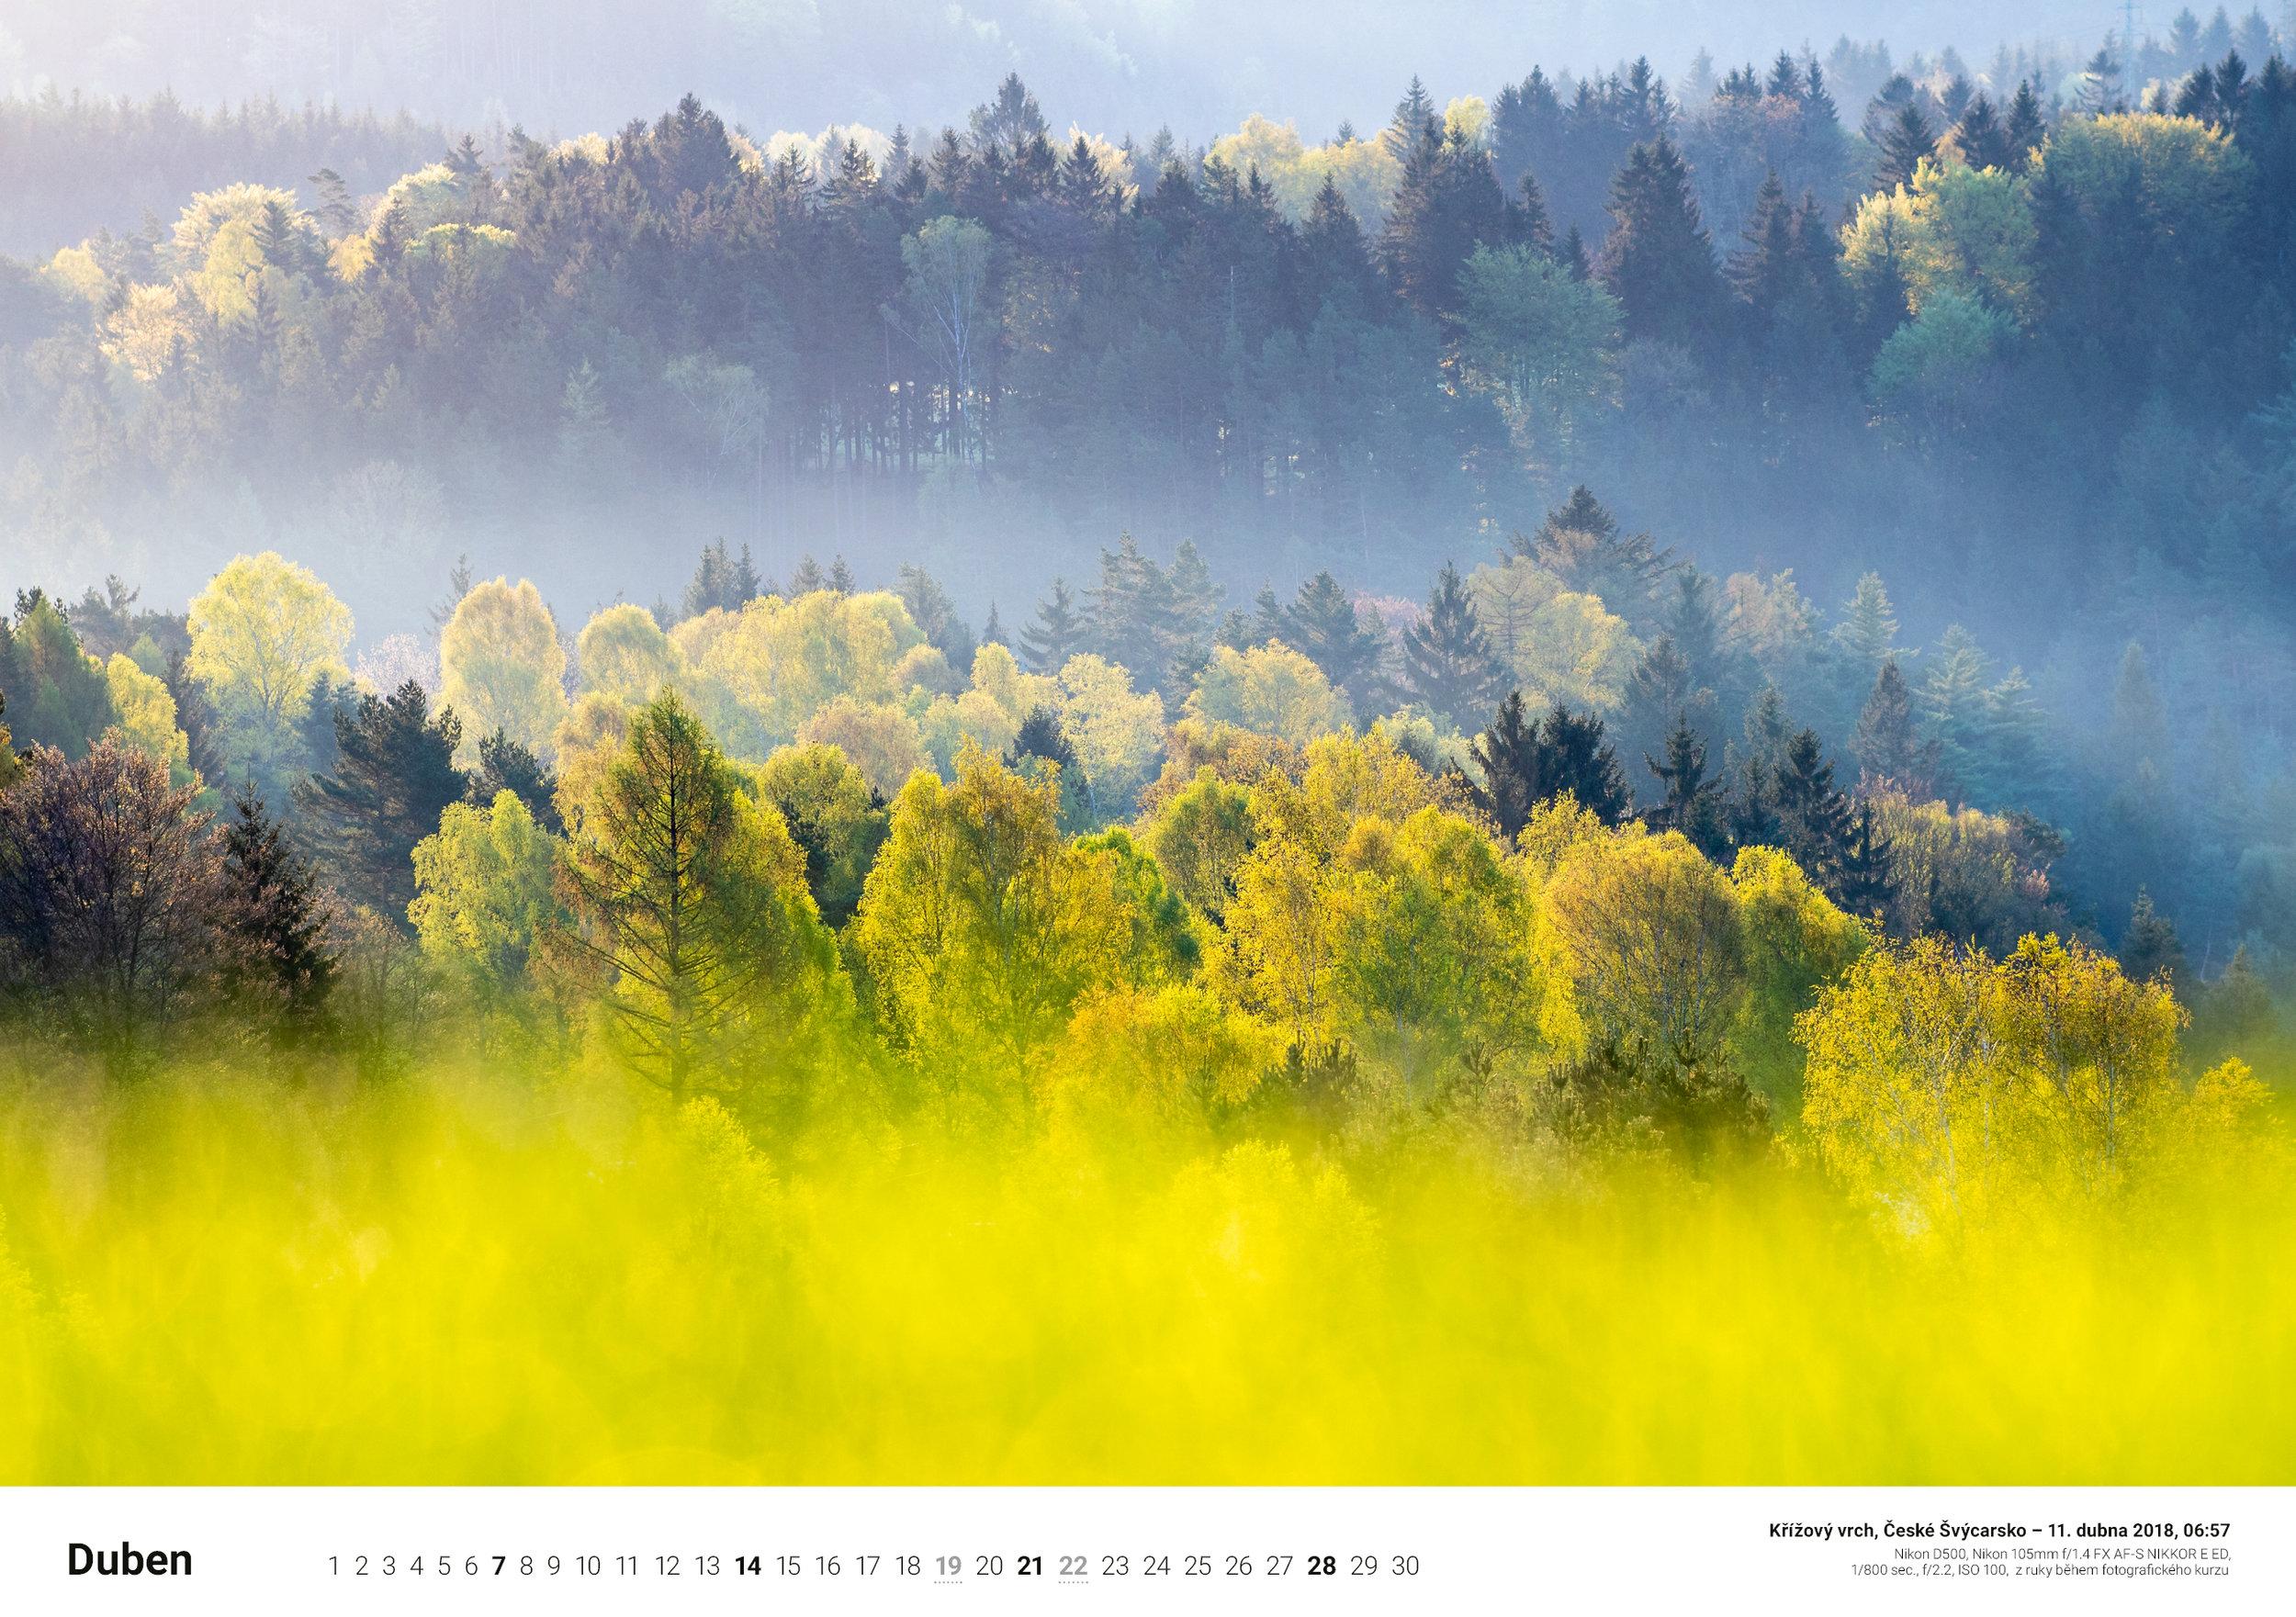 juracka_kalendar-2019_440x310mm_05.jpg